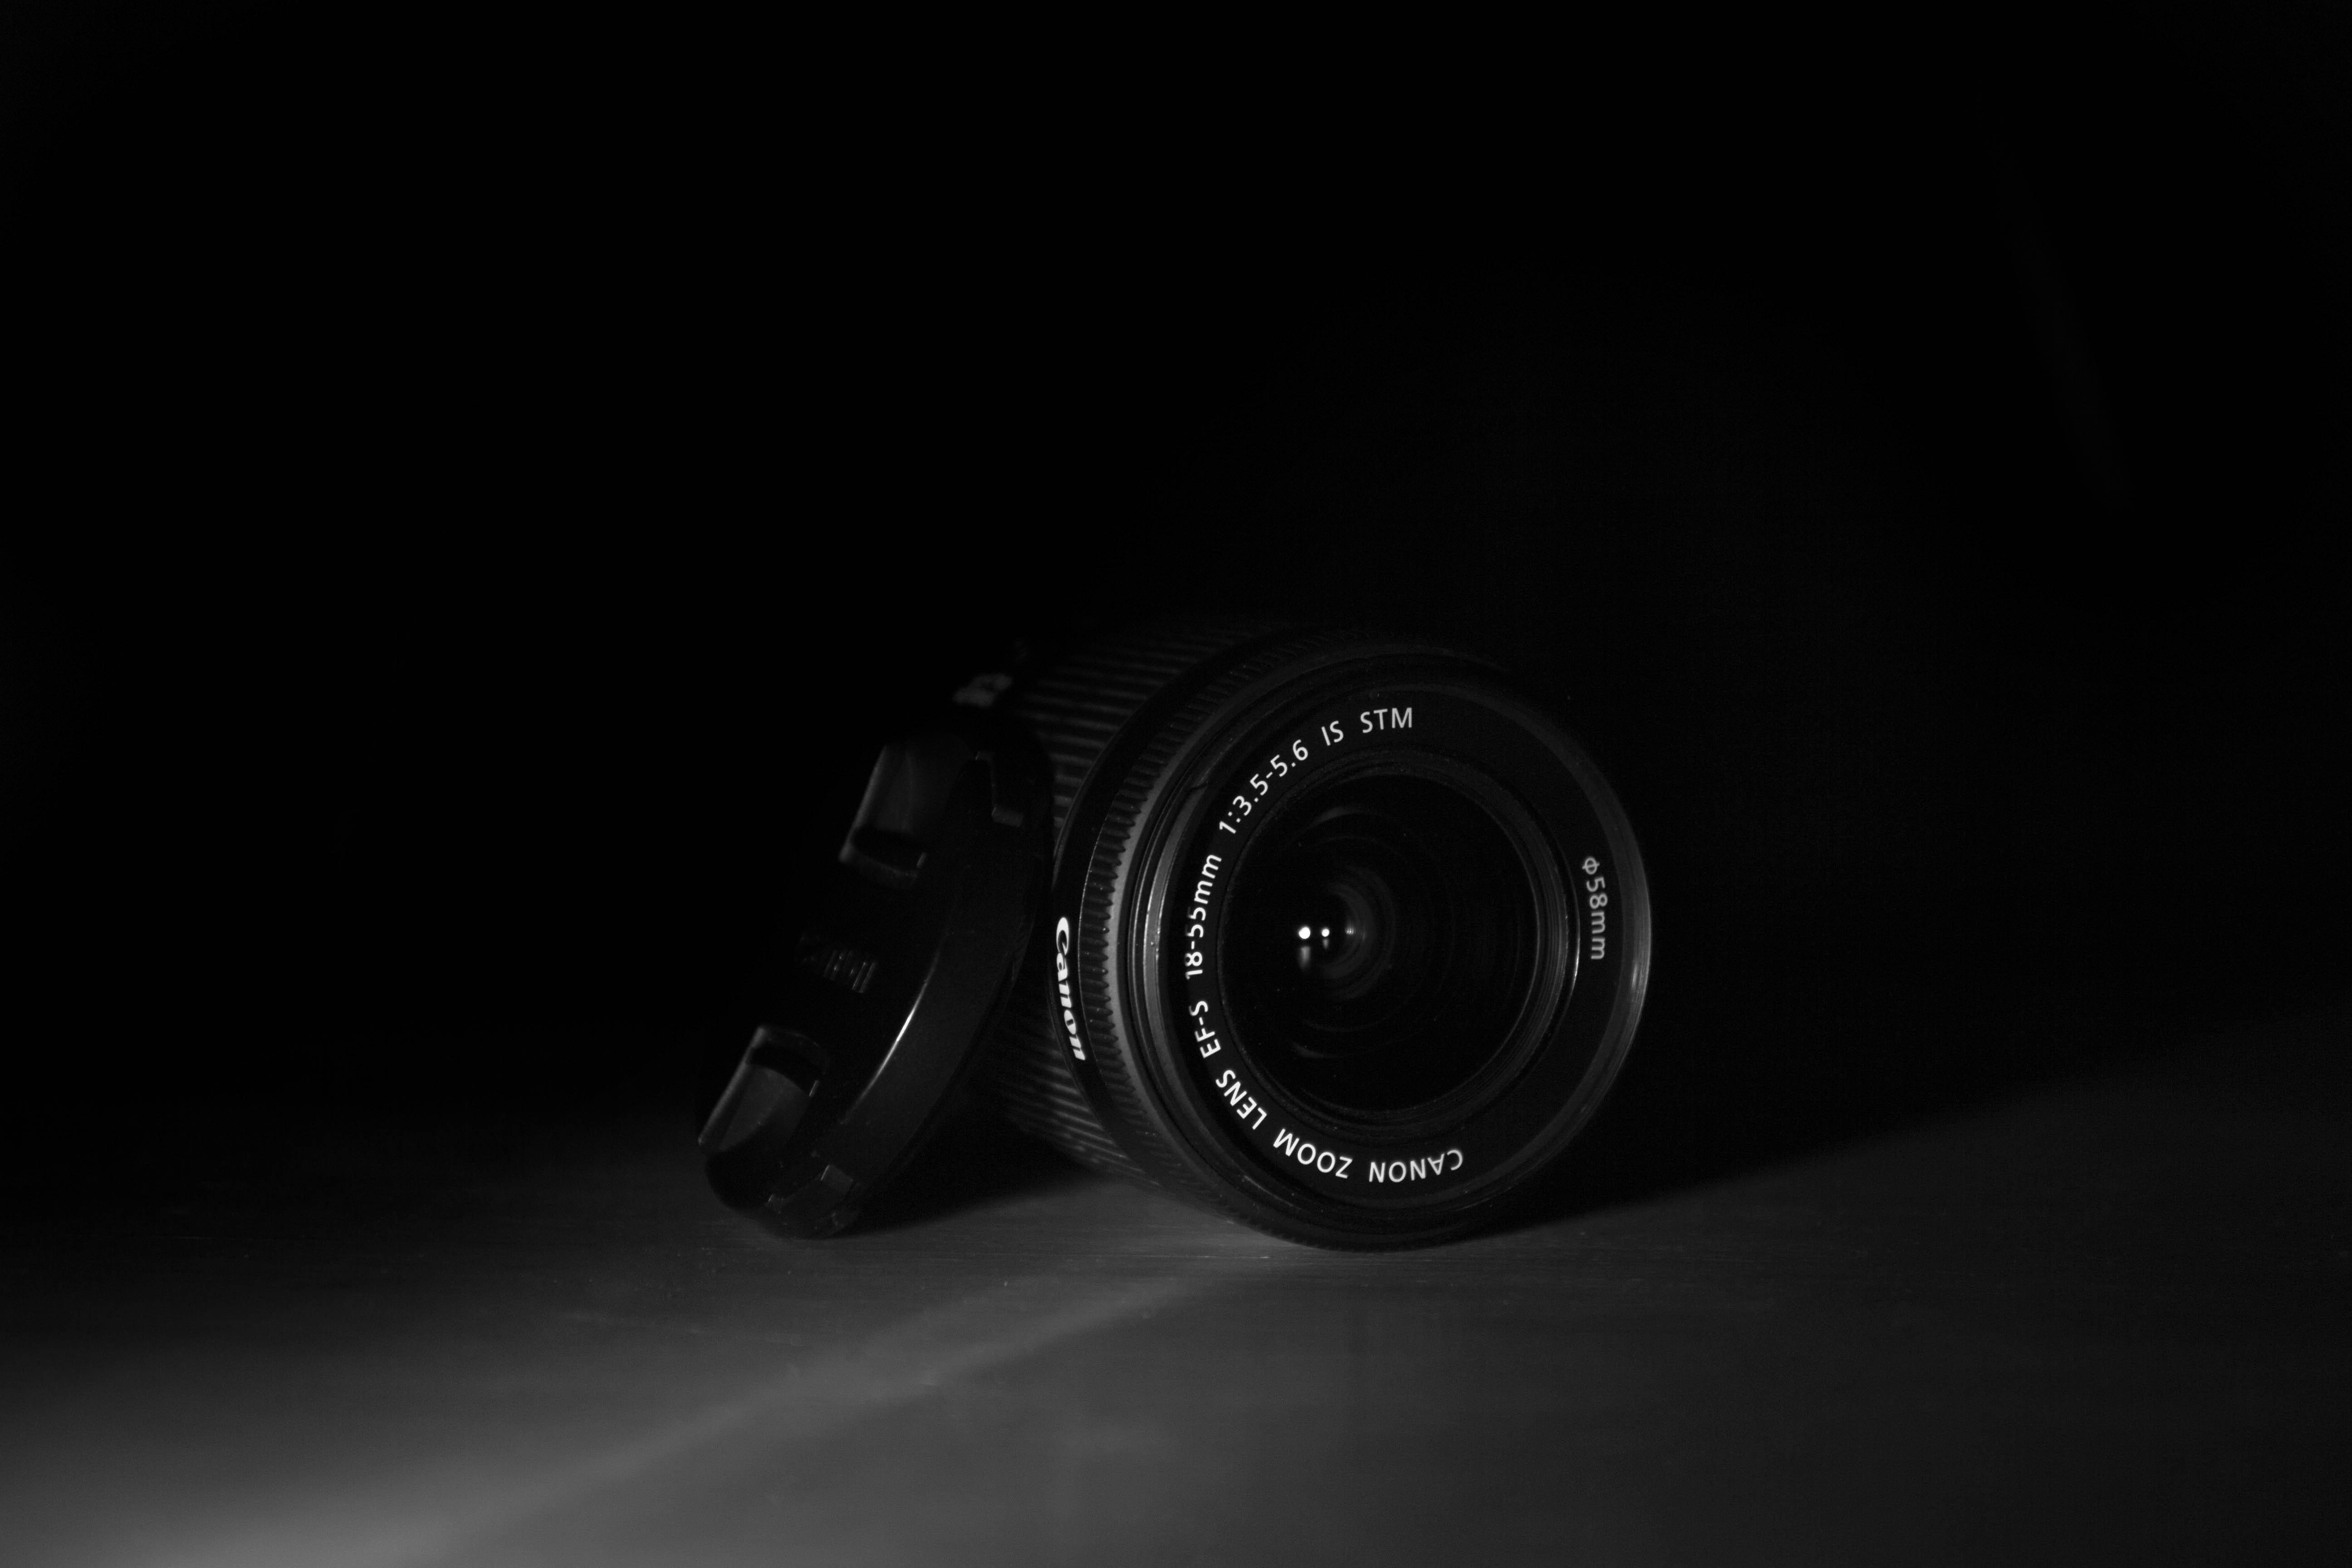 Black Dslr Camera With Black Background Free Stock Photo